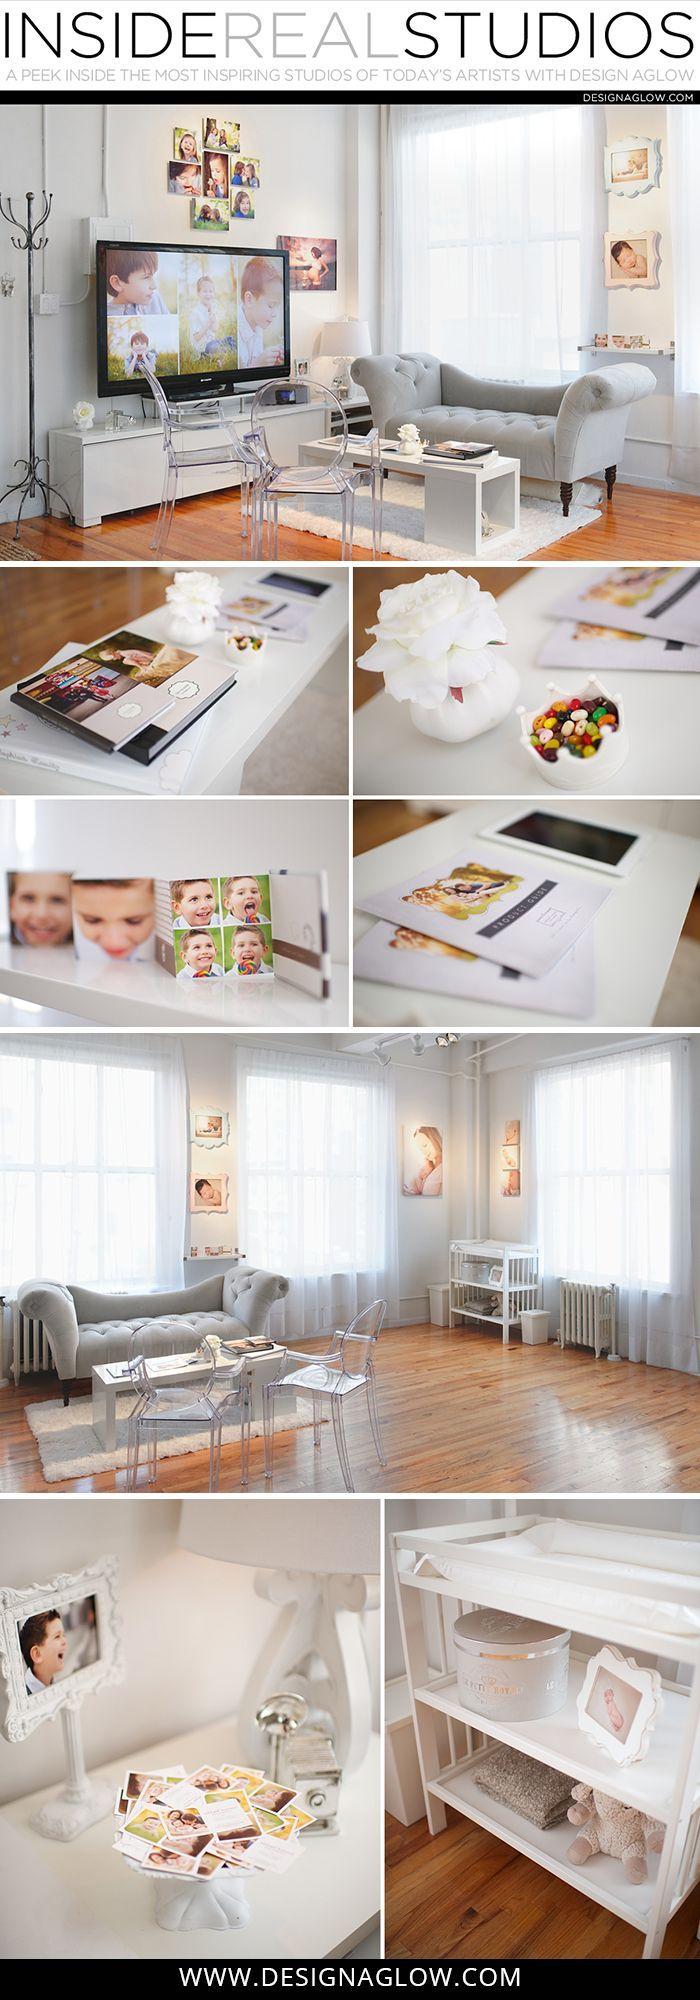 sight3 | studio ideas | Pinterest | Studio, Photography studios and ...